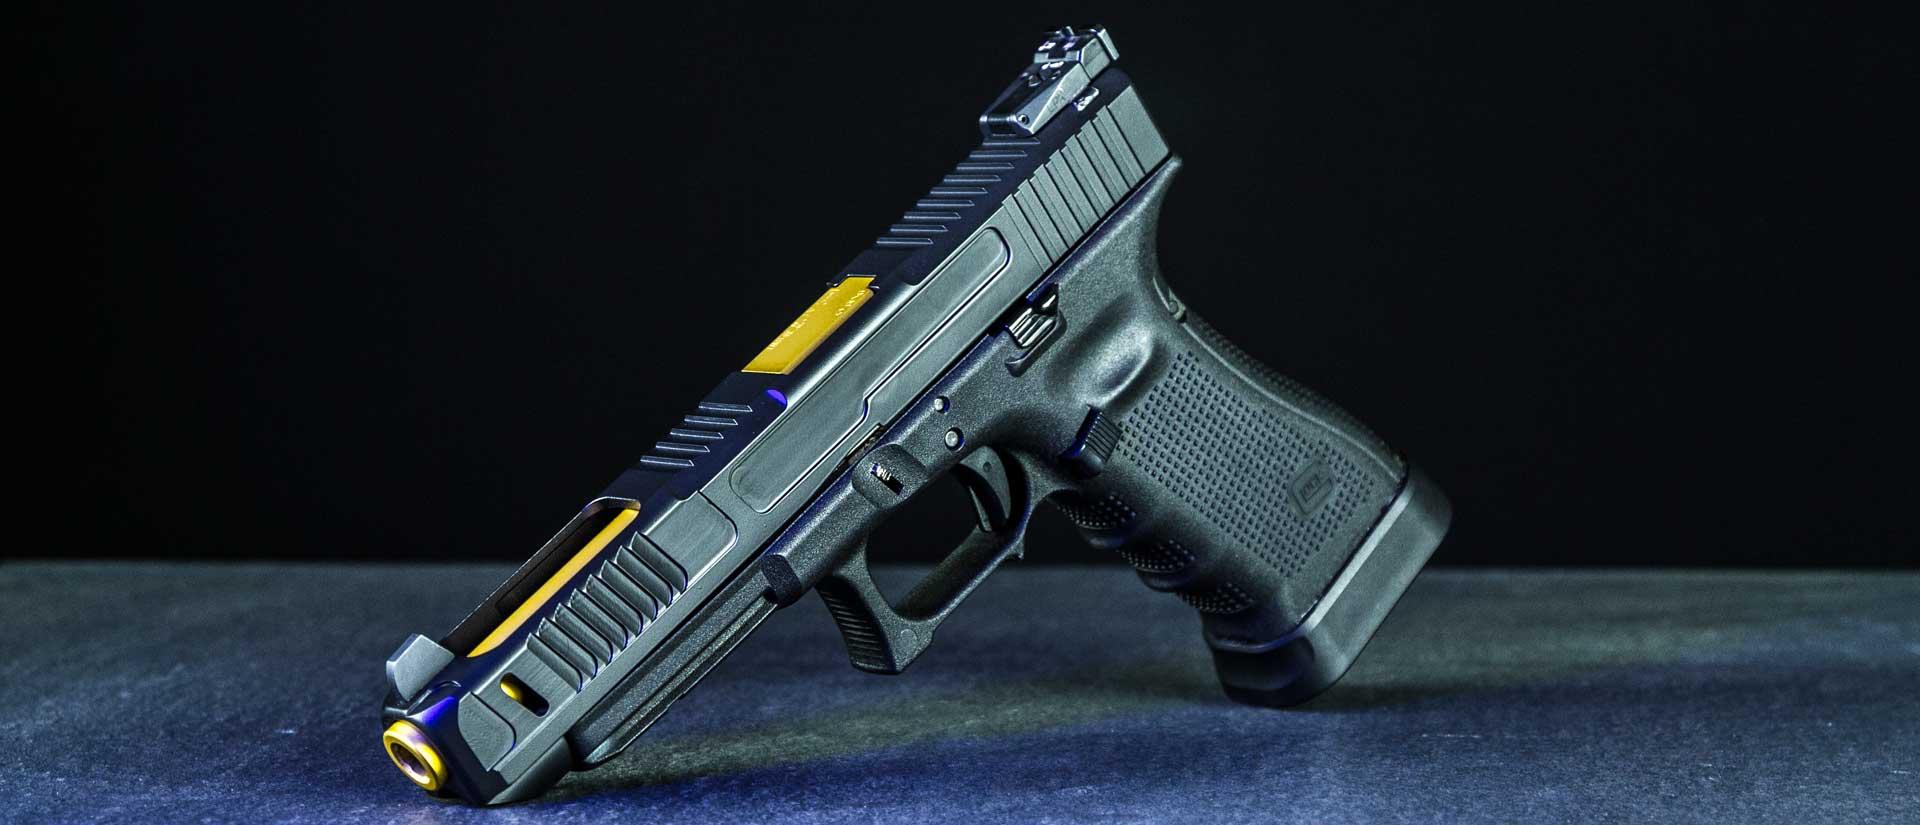 verex-tactical-tuning-waffen-pistole-glock-sig-sauer-17-cz-walther-visier-bruenieren-ar15-red-dot-beschichtung-tuning-cerakote-stippling-griptech-salzburg-slider-02